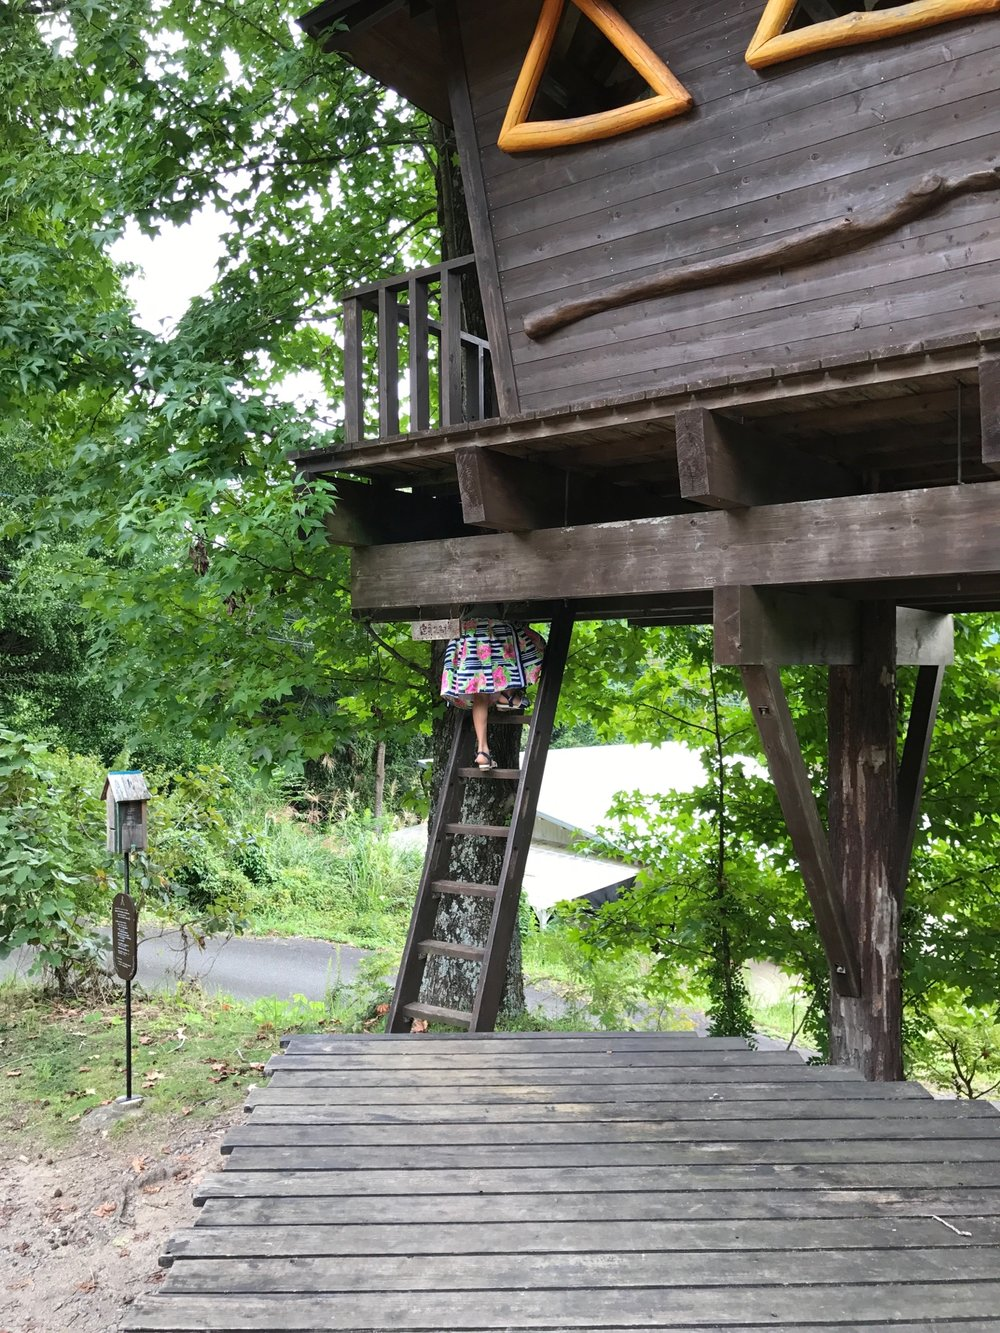 Irene climbing on the treehouse!